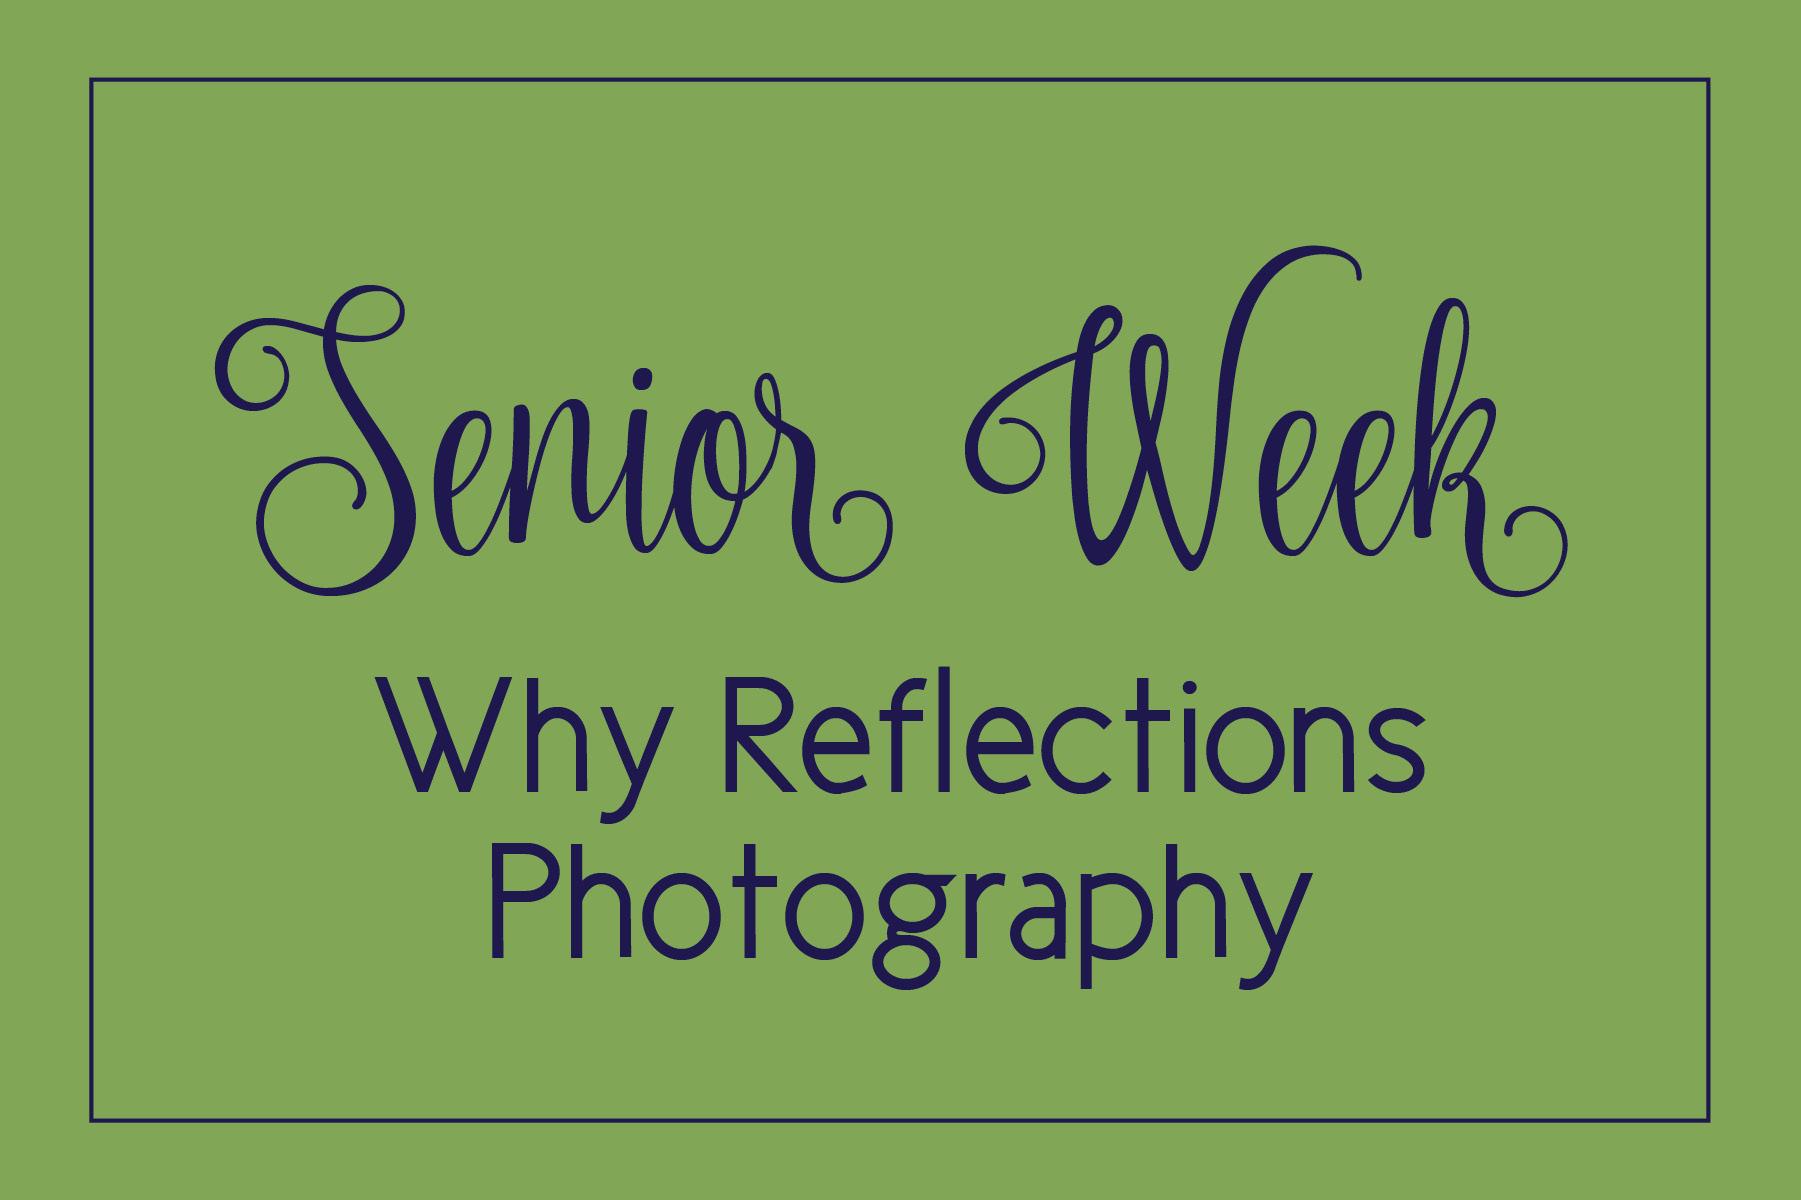 senior week why reflections.jpg